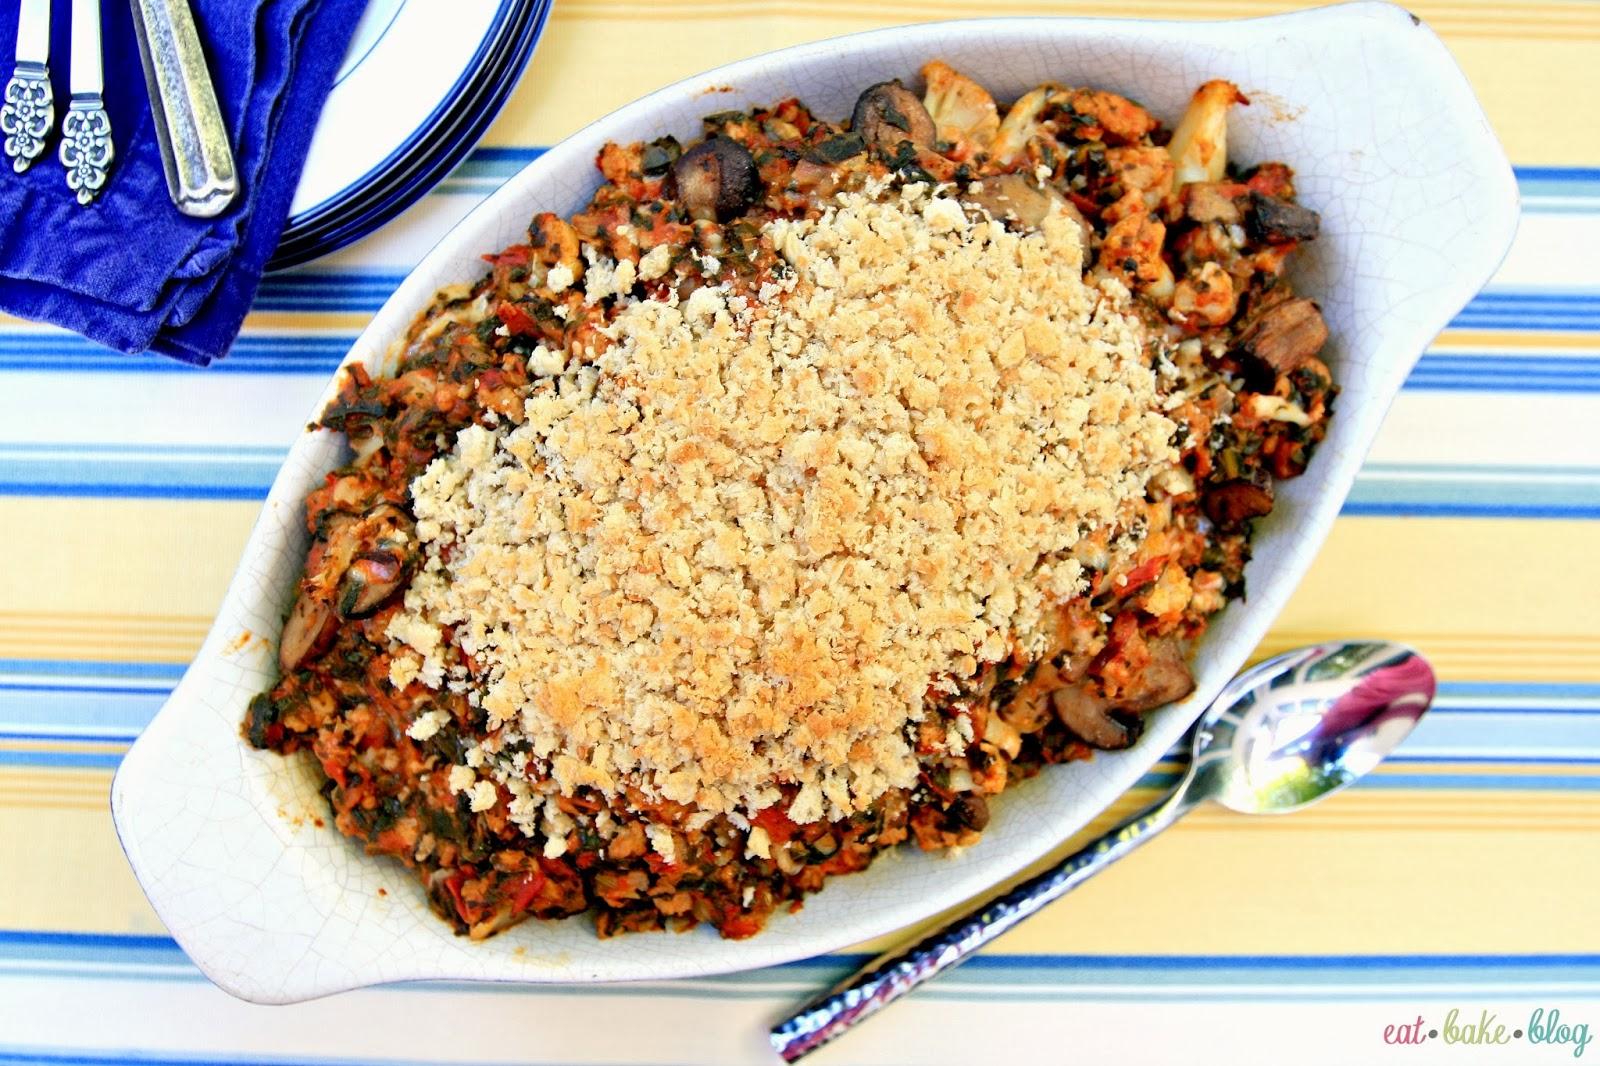 easy weeknight casserole, make-ahead dinner recipe, best sausage casserole recipe, vegetable casserole recipe